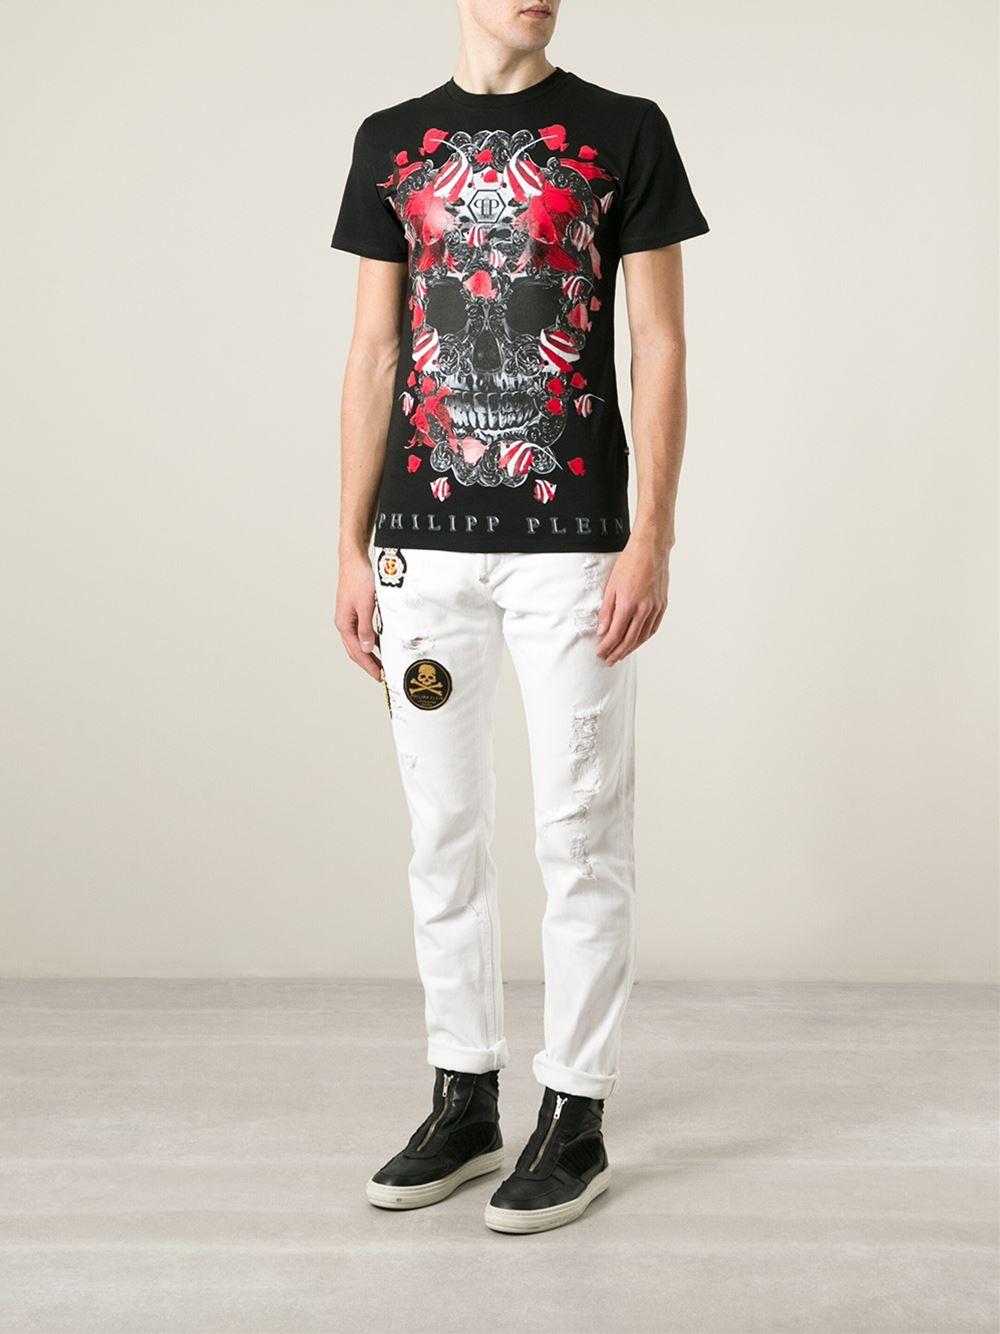 Philipp Plein Clown Fish Cotton T Shirt In Black For Men Lyst